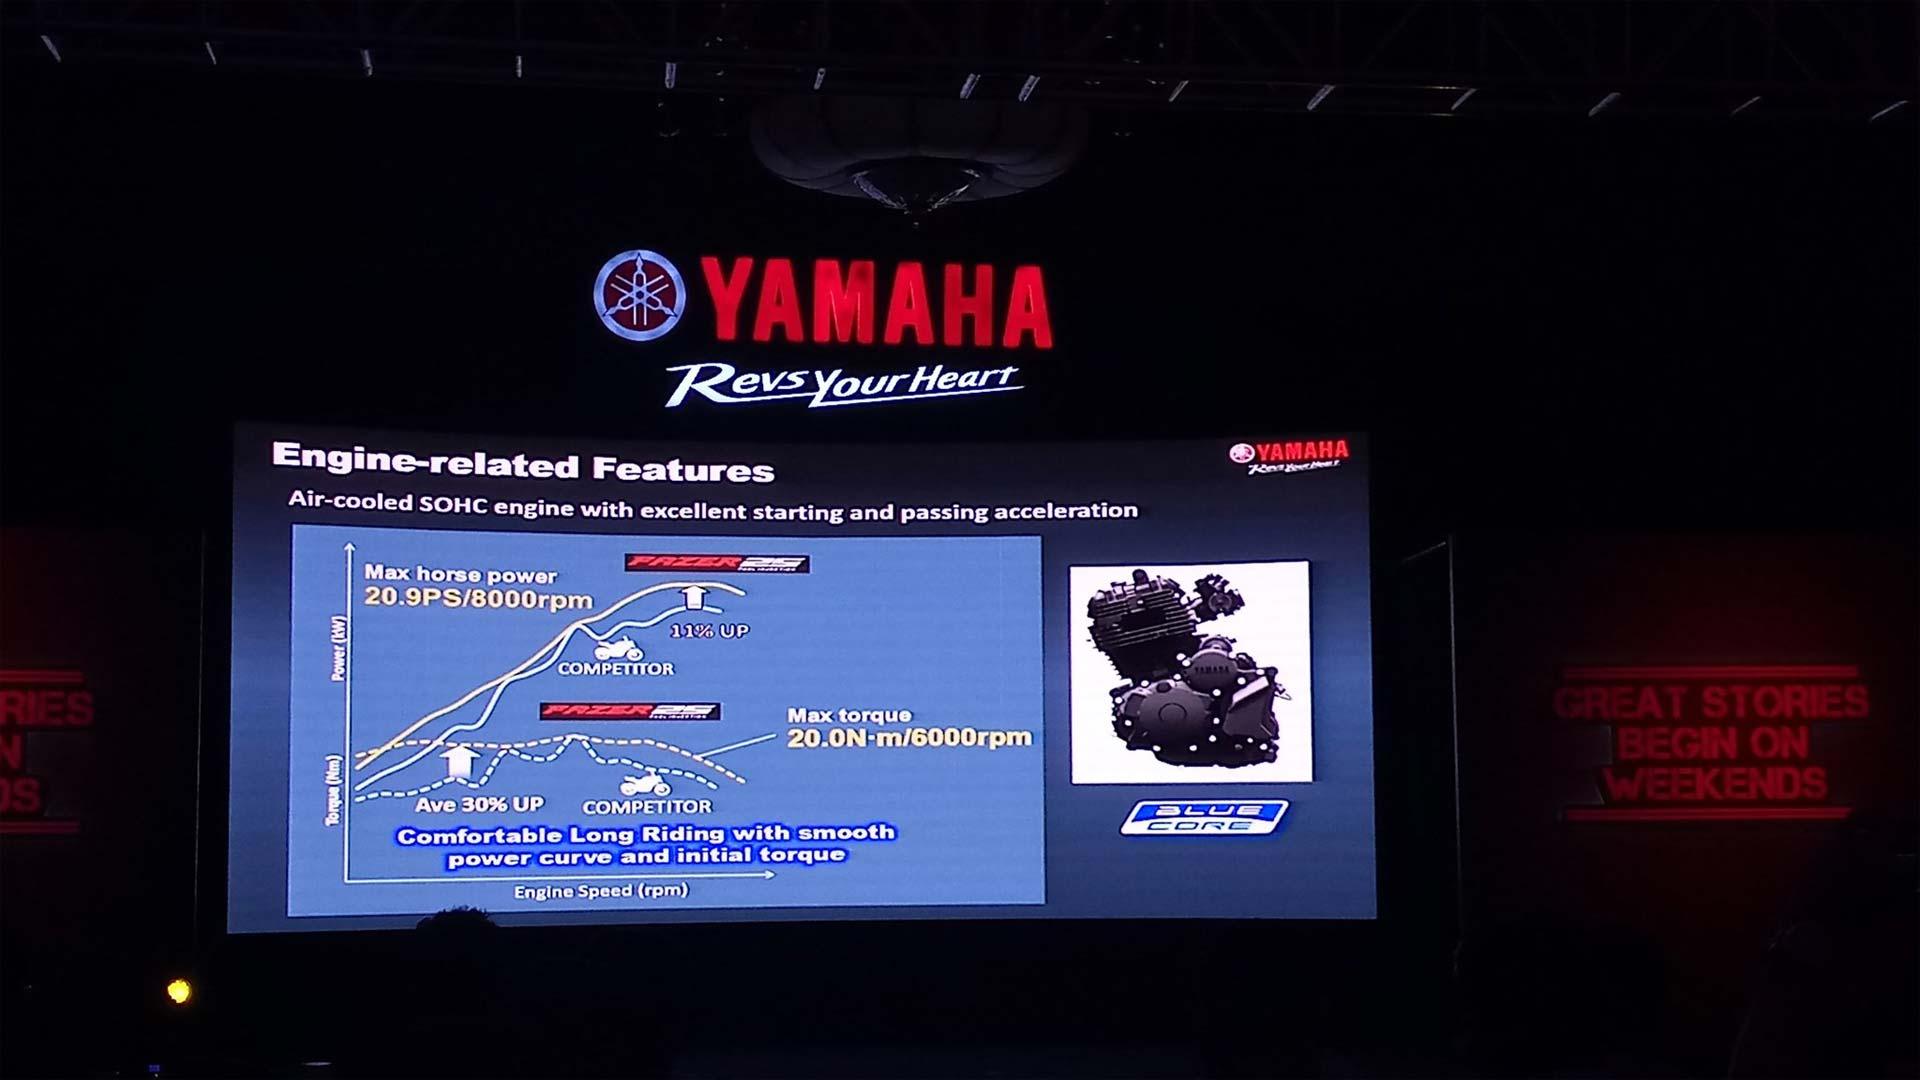 Yamaha-Fazer-25-power-and-torque